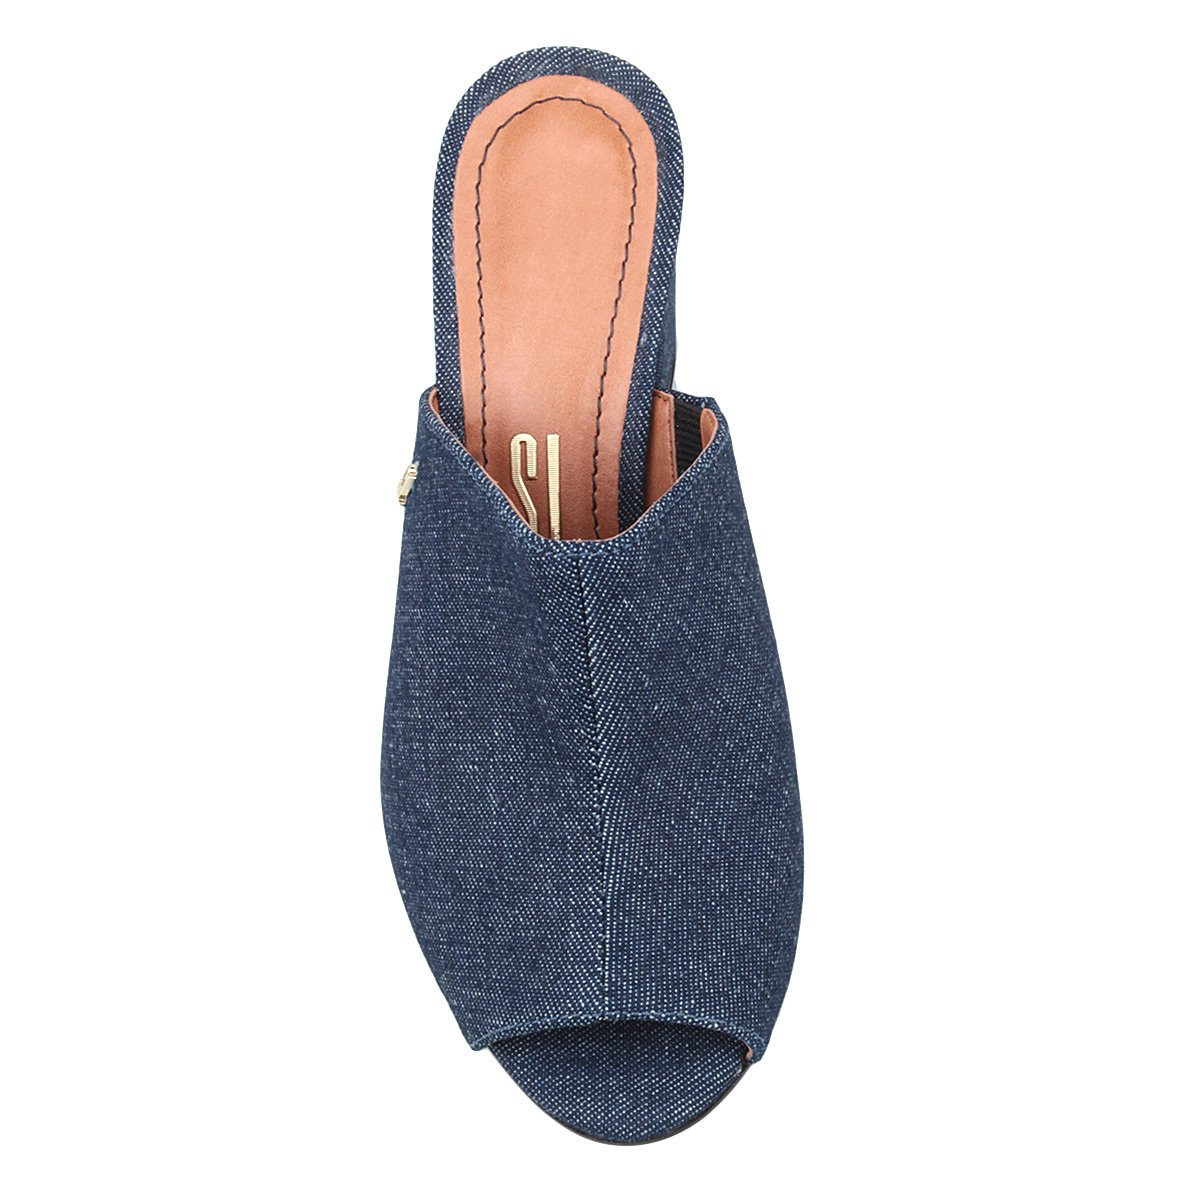 Grosso Lolla Tamanco Jeans Santa Feminino Salto Santa Jeans Tamanco Lolla Salto qF6PaPw0